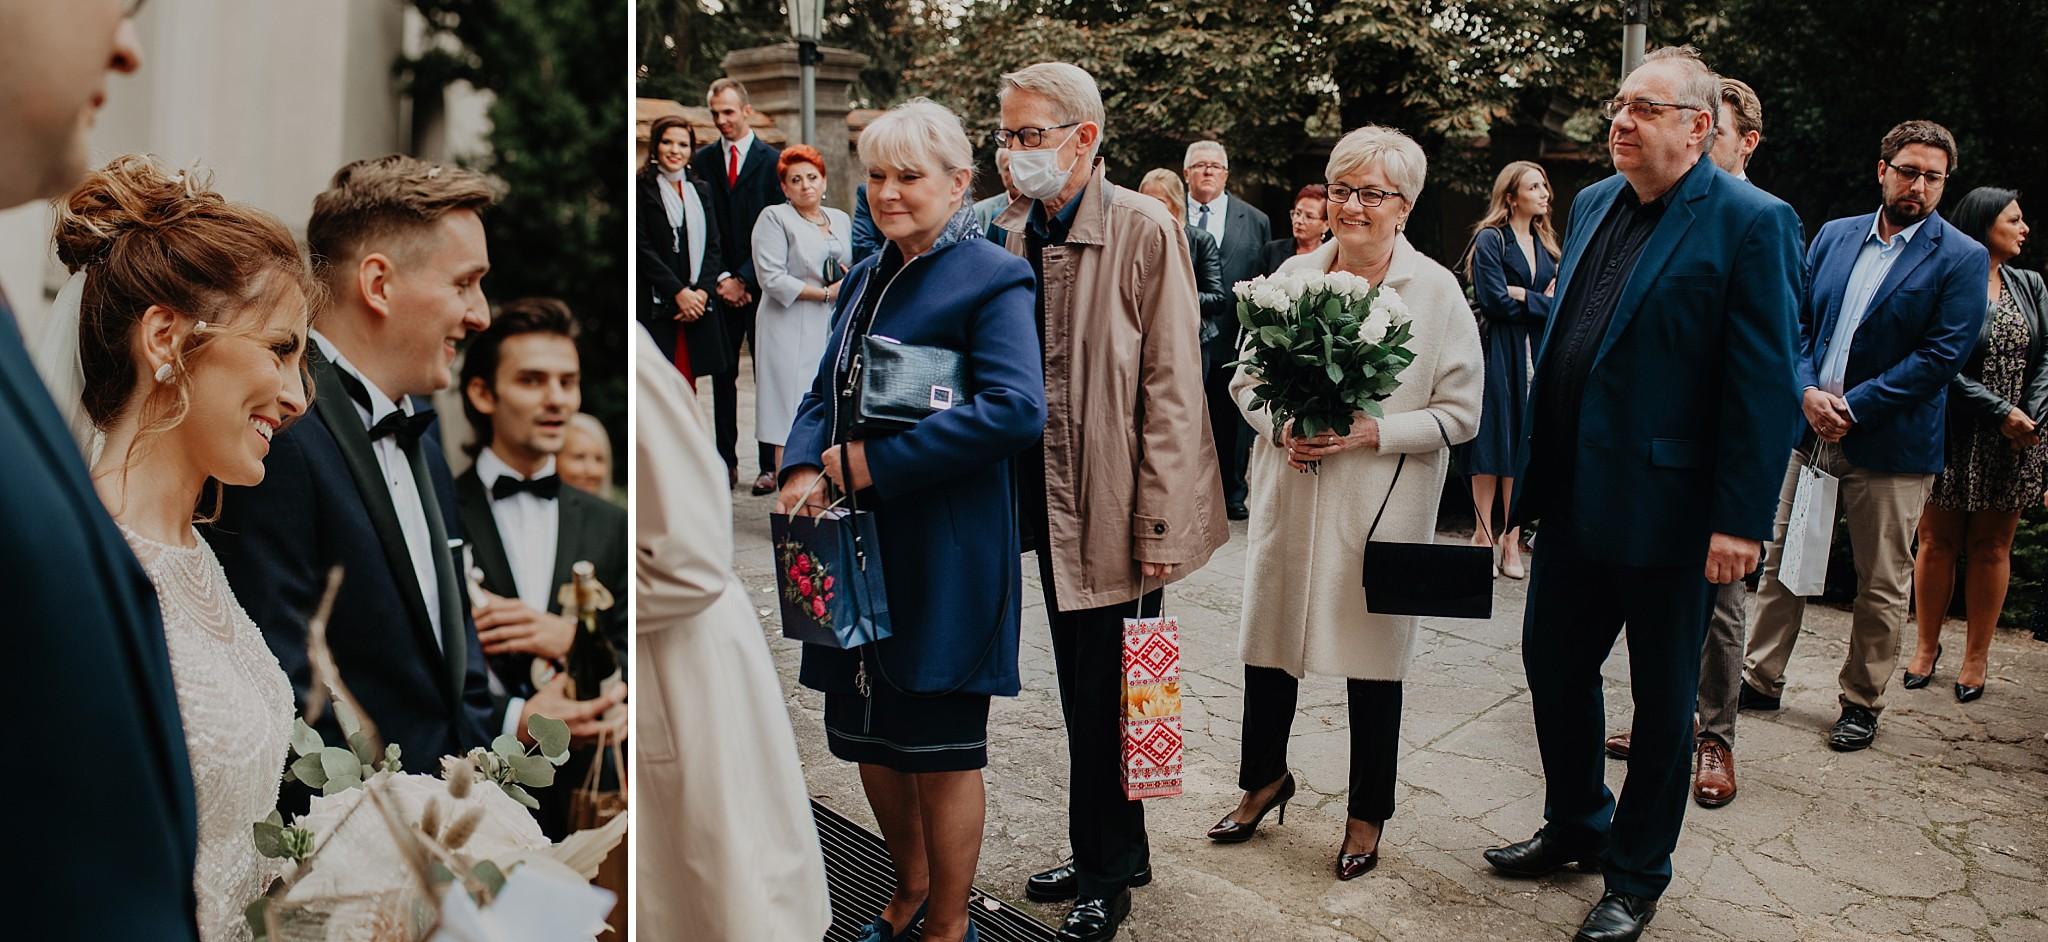 fotograf poznan wesele dobra truskawka piekne wesele pod poznaniem wesele w dobrej truskawce piekna para mloda slub marzen slub koronawirus slub listopad wesele koronawirus 231